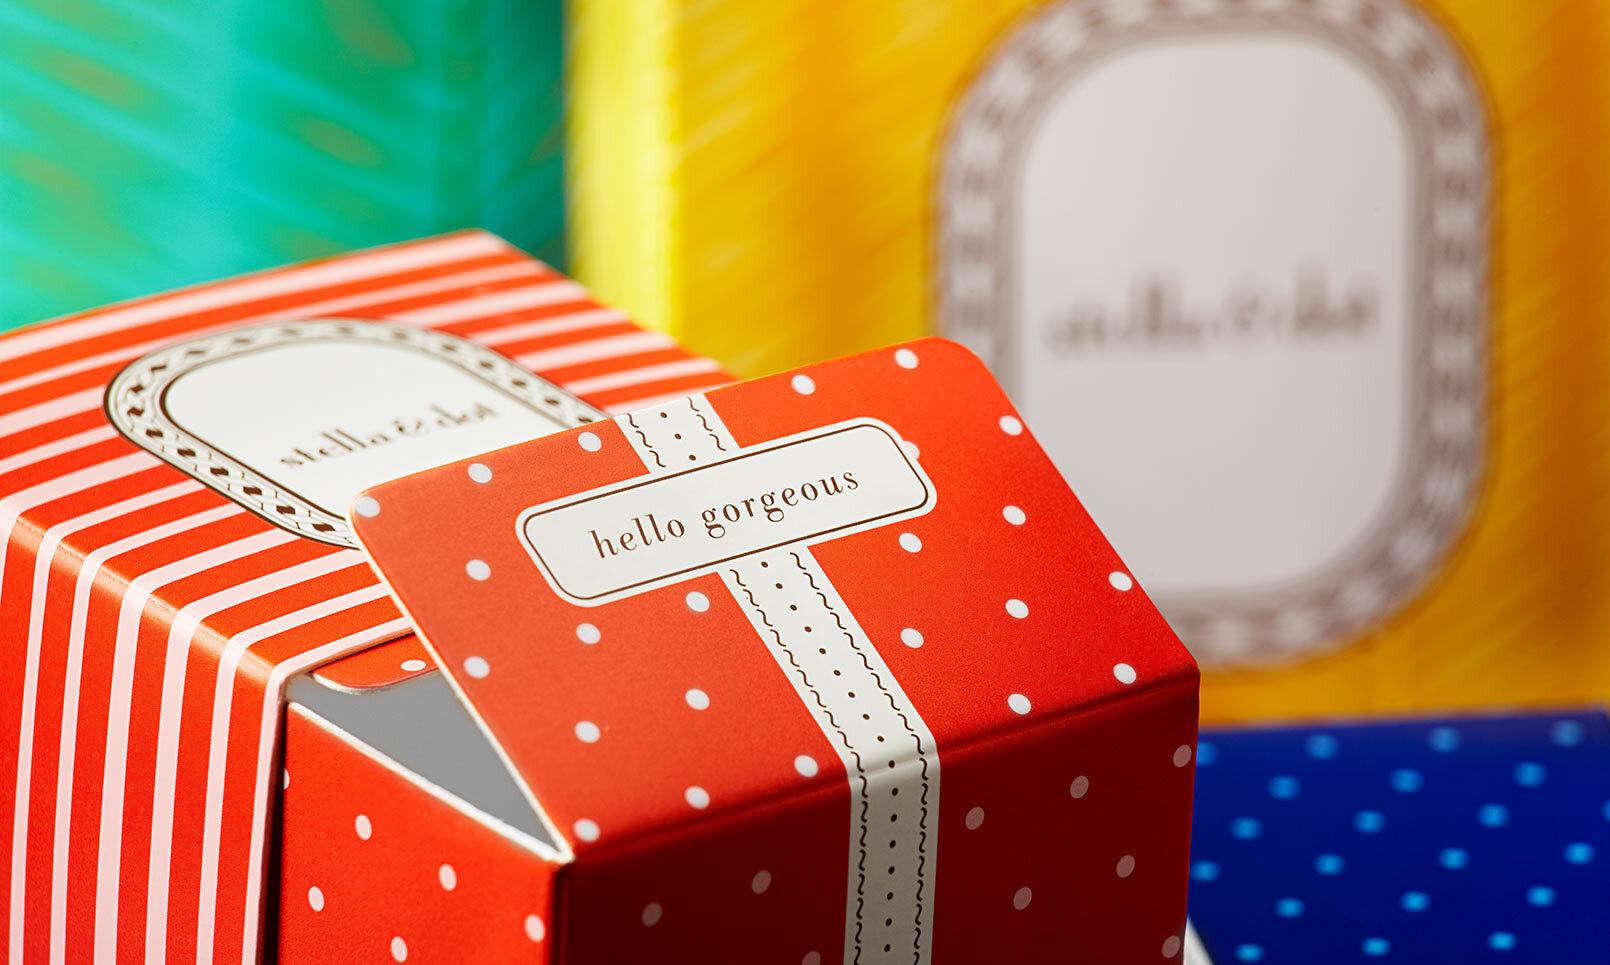 Stella-and-dot-jewelry-box-design-packaging-company-2.jpg